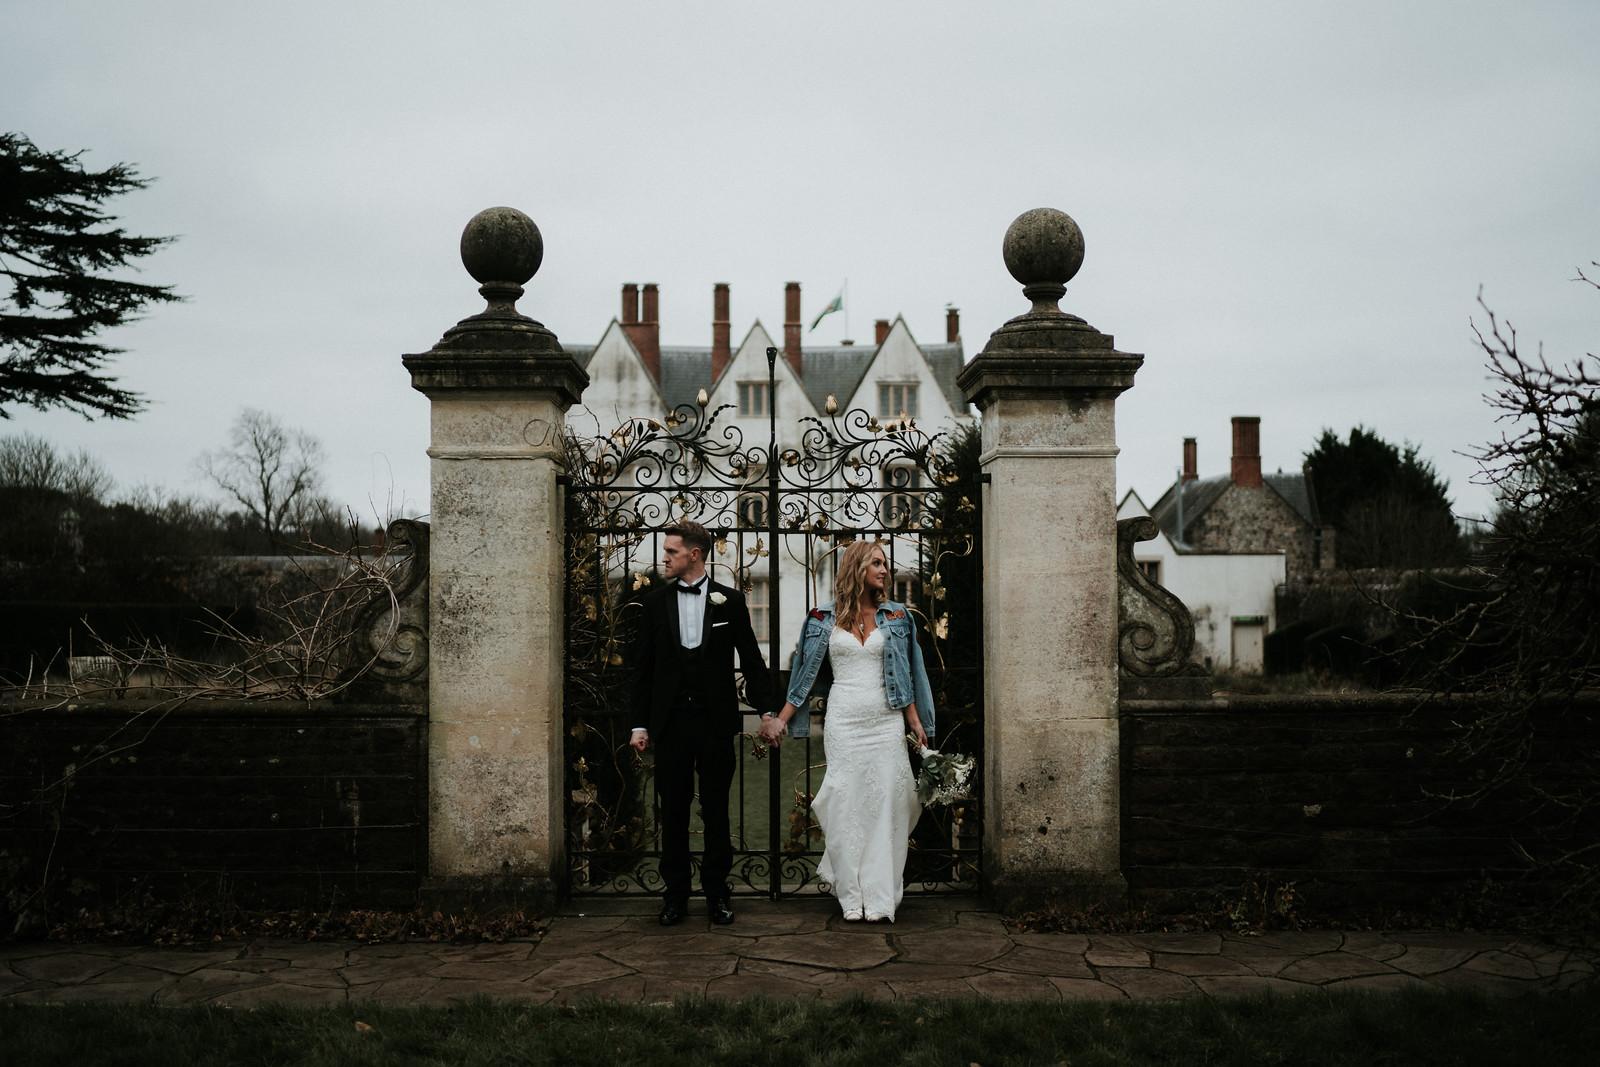 Bride and Groom Wedding Photo Outside Venue - Rustic Theme Wedding Photo - Wedding Photographers Swansea